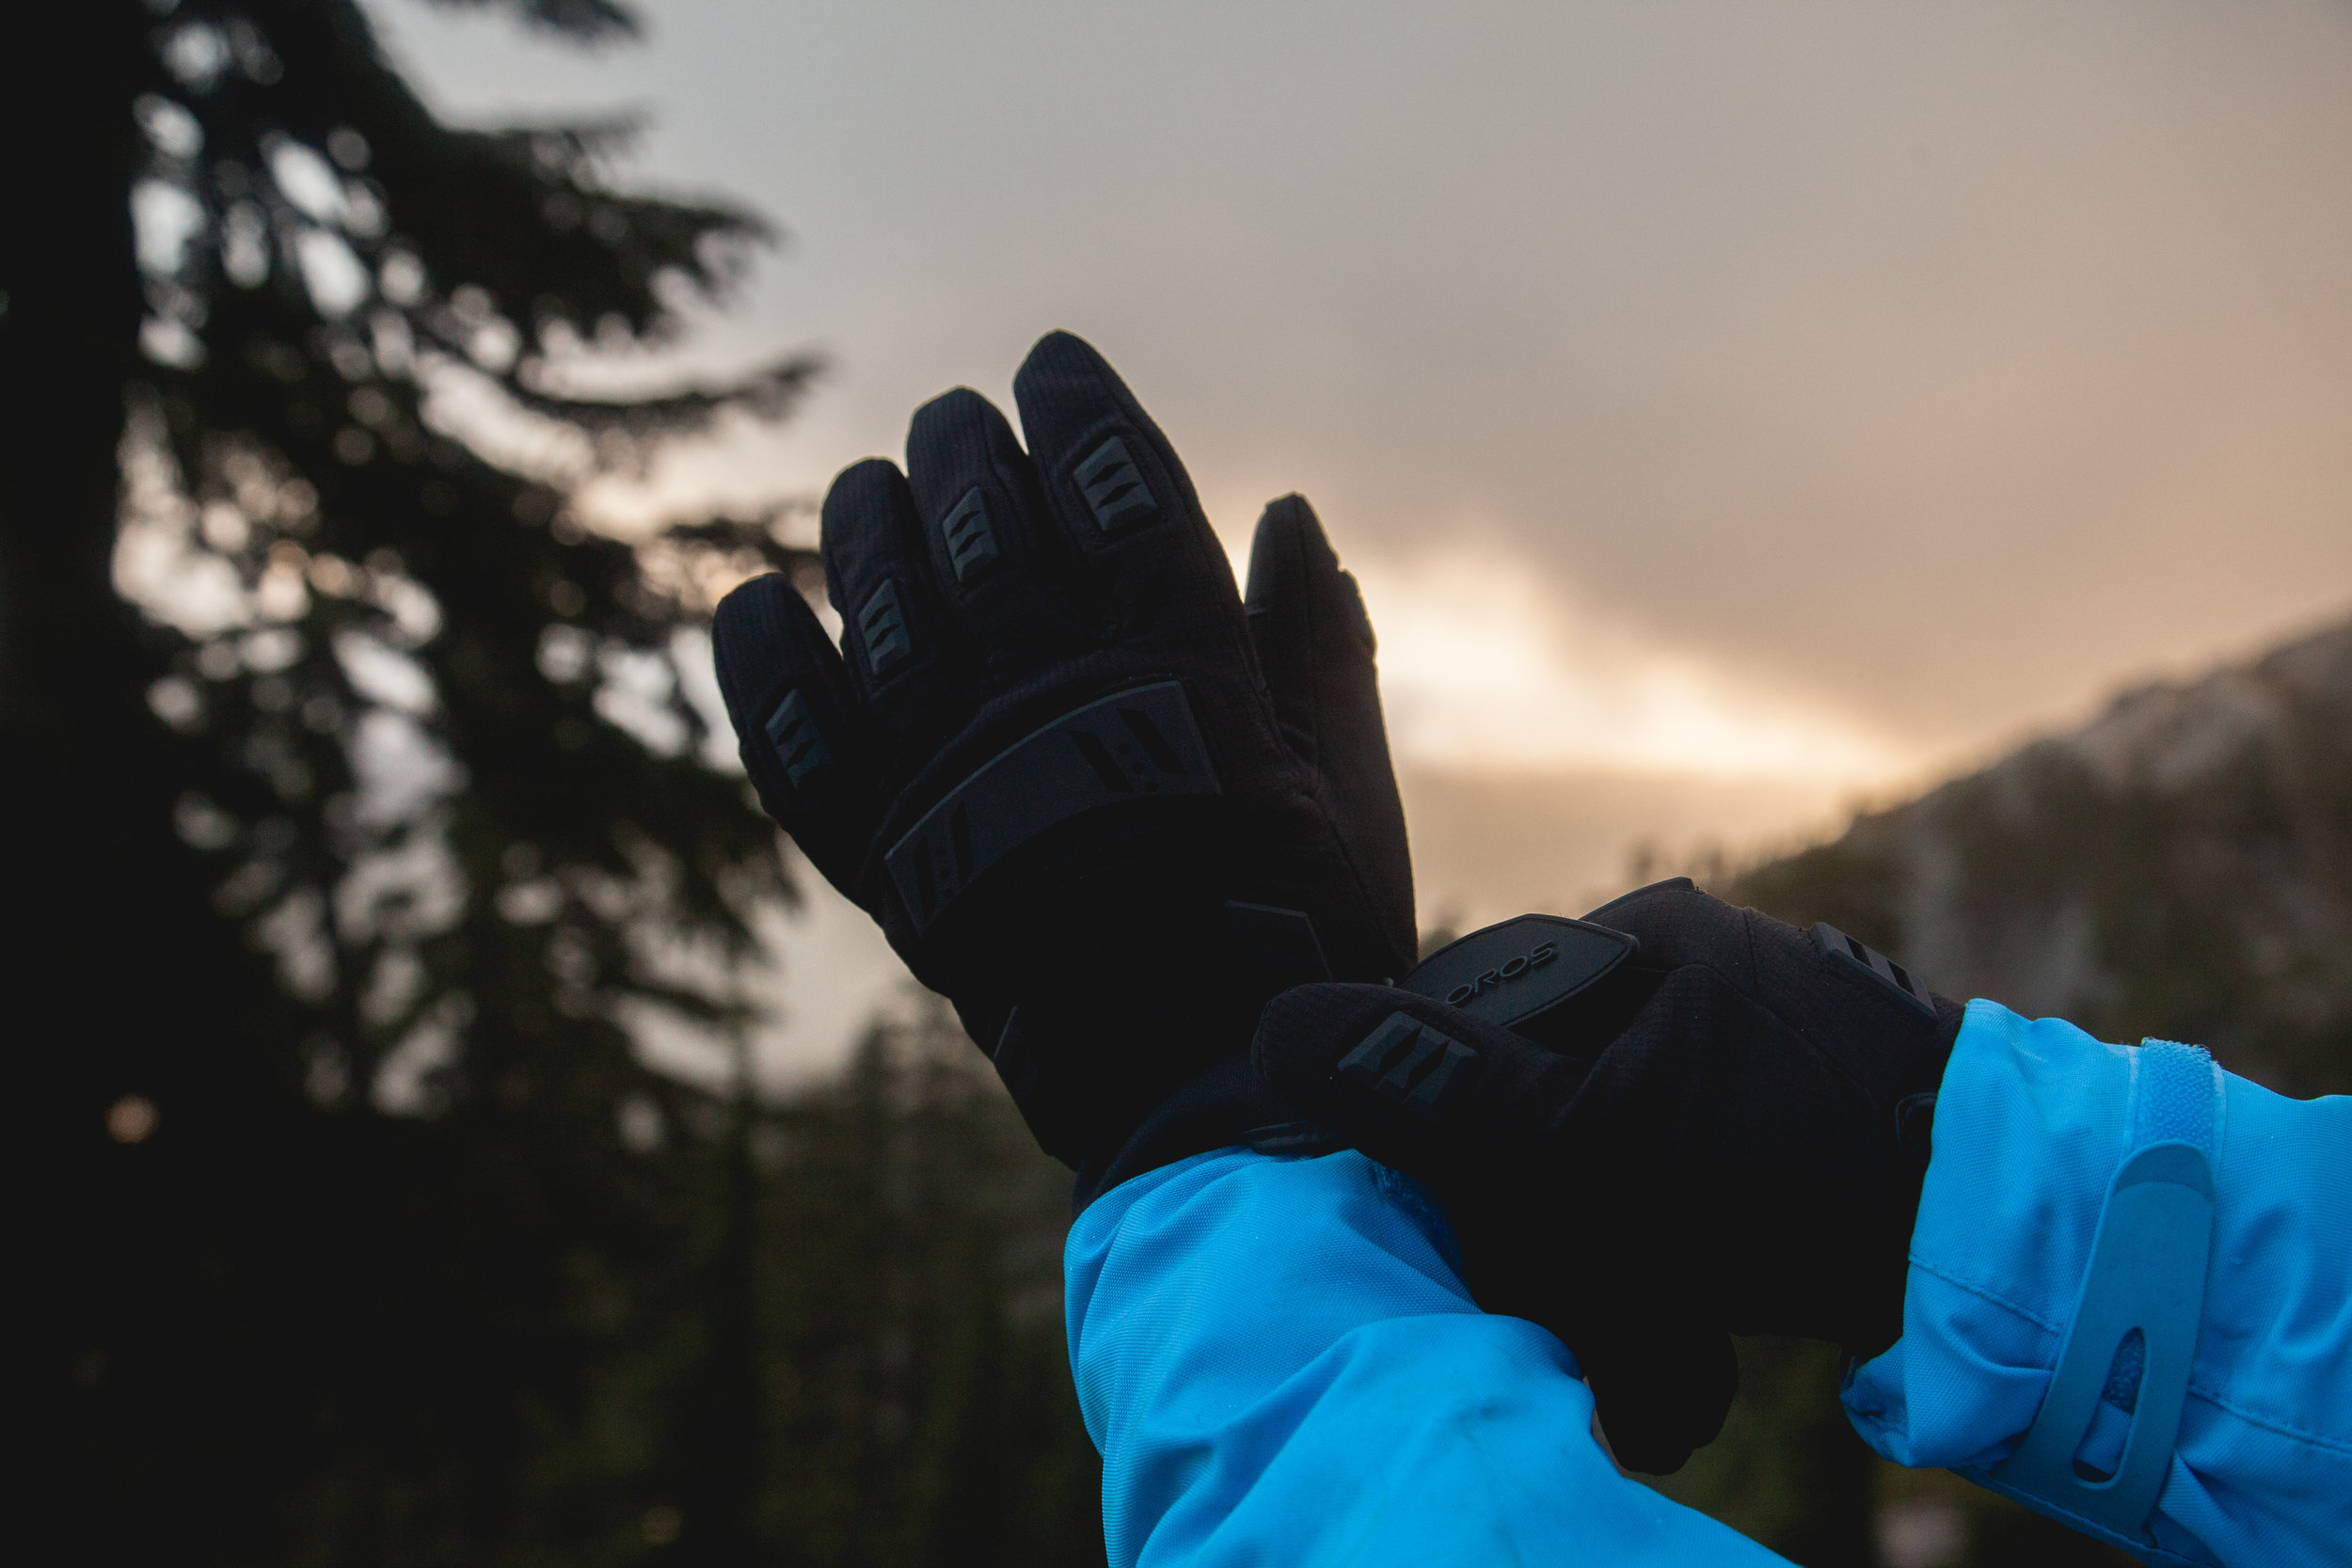 Oros Gloves